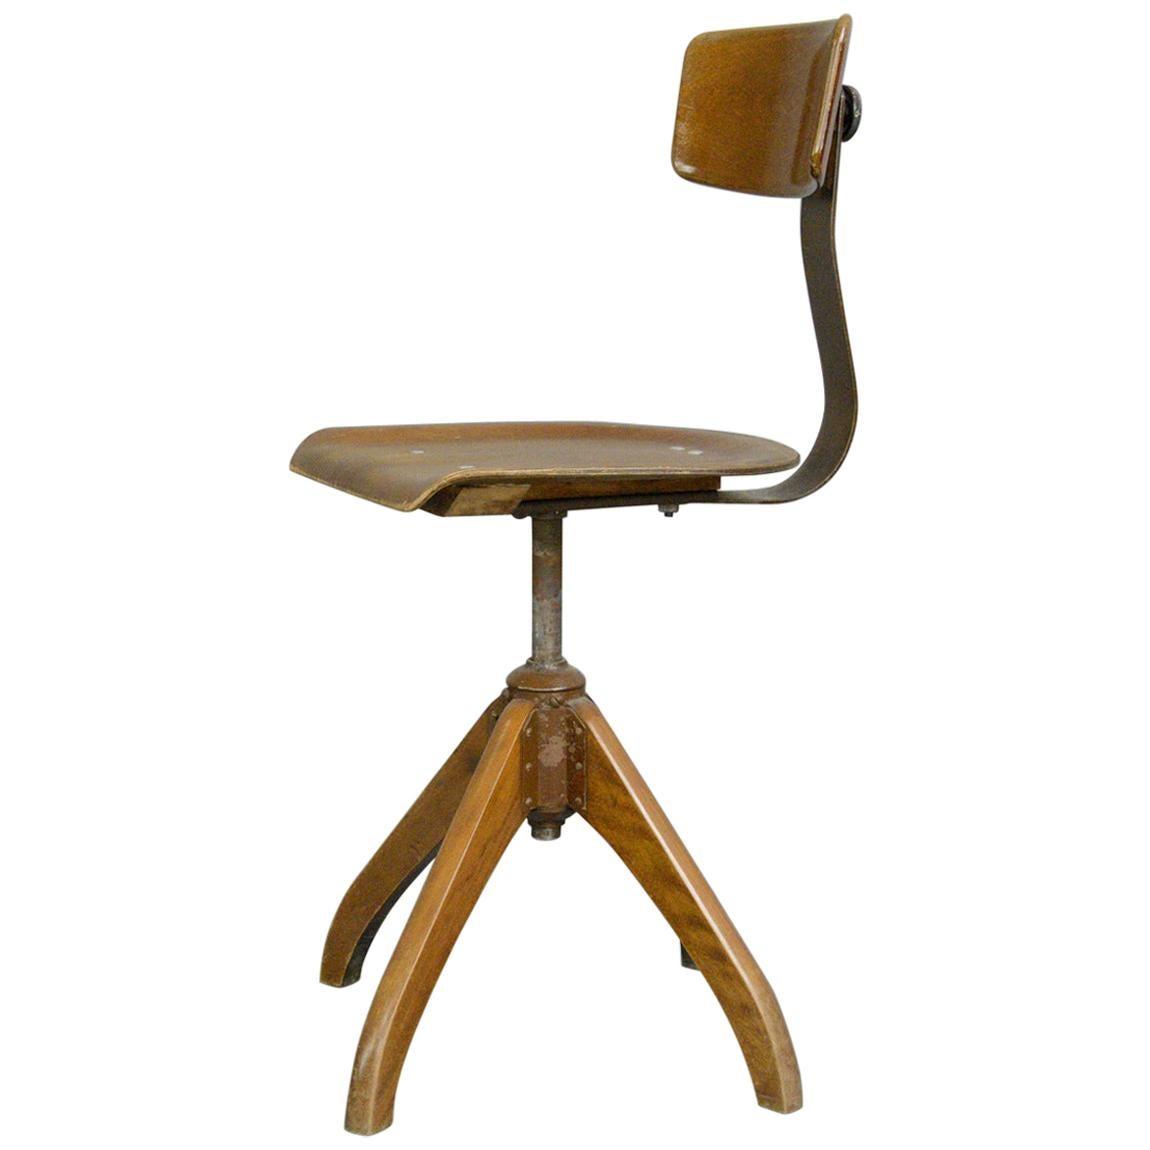 German Desk Chair by Ama Elastik, circa 1930s